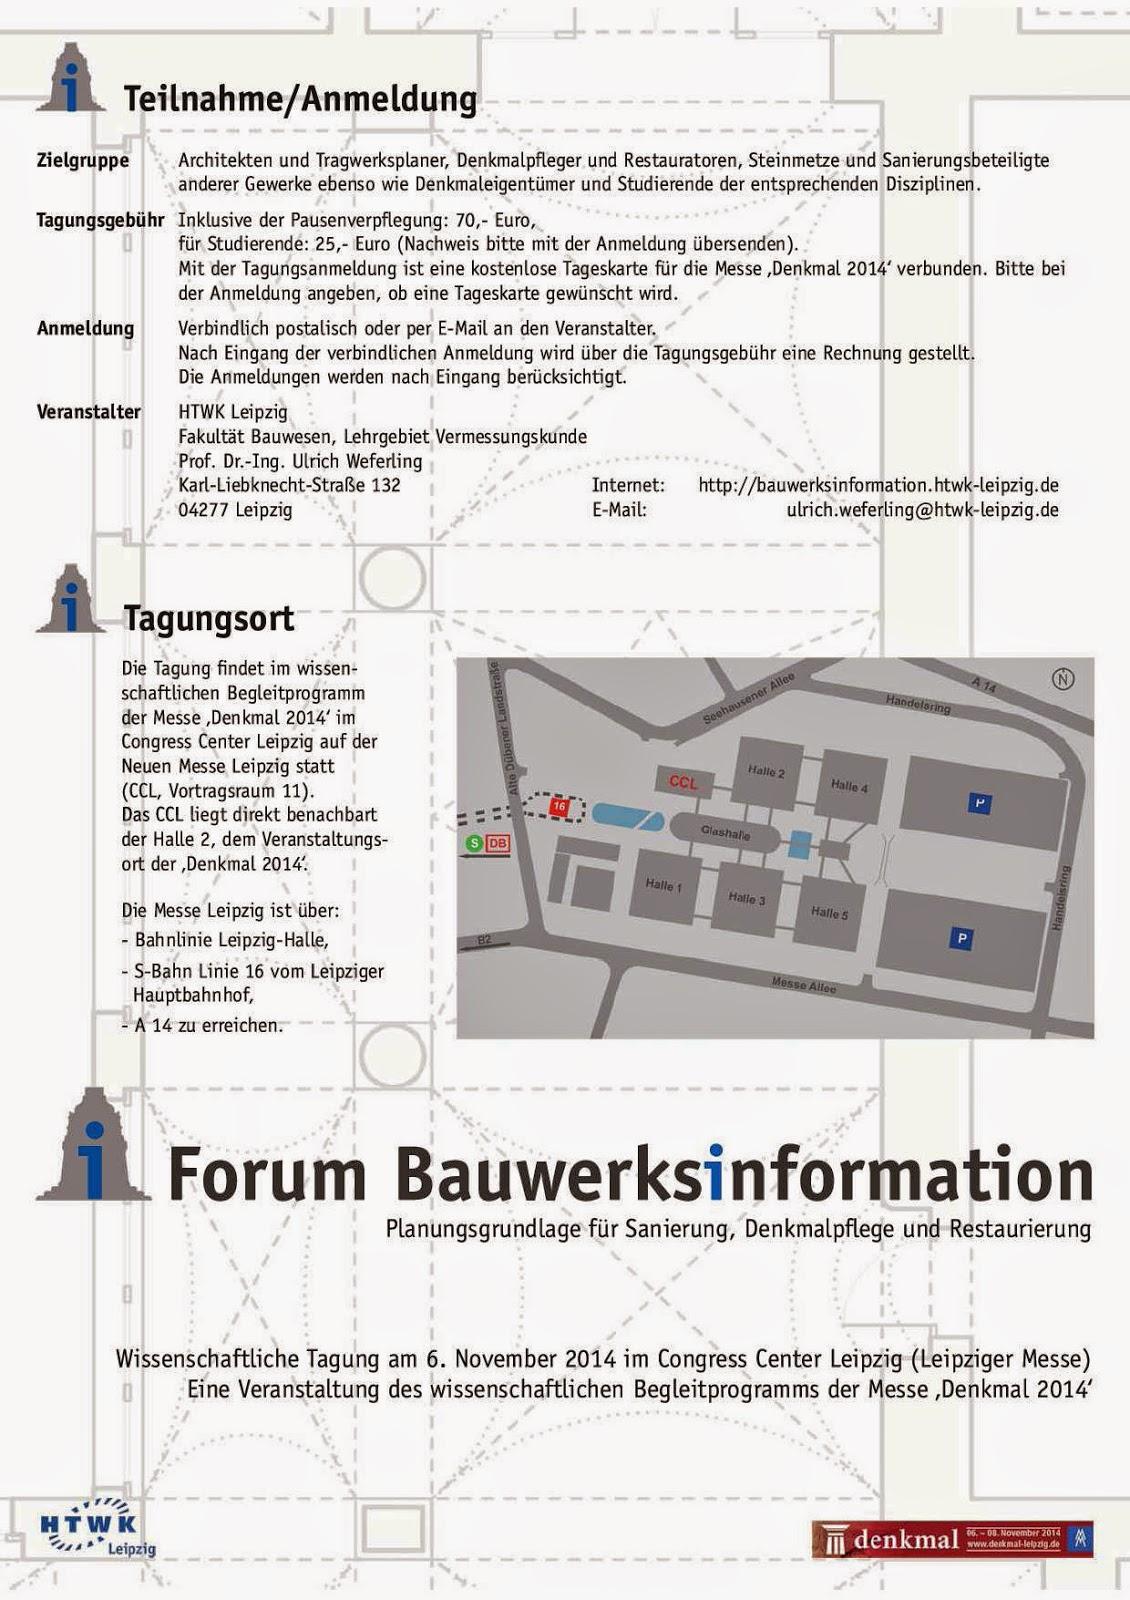 Förderverein Bamberger Denkmalpfleger e.V.: Oktober 2014